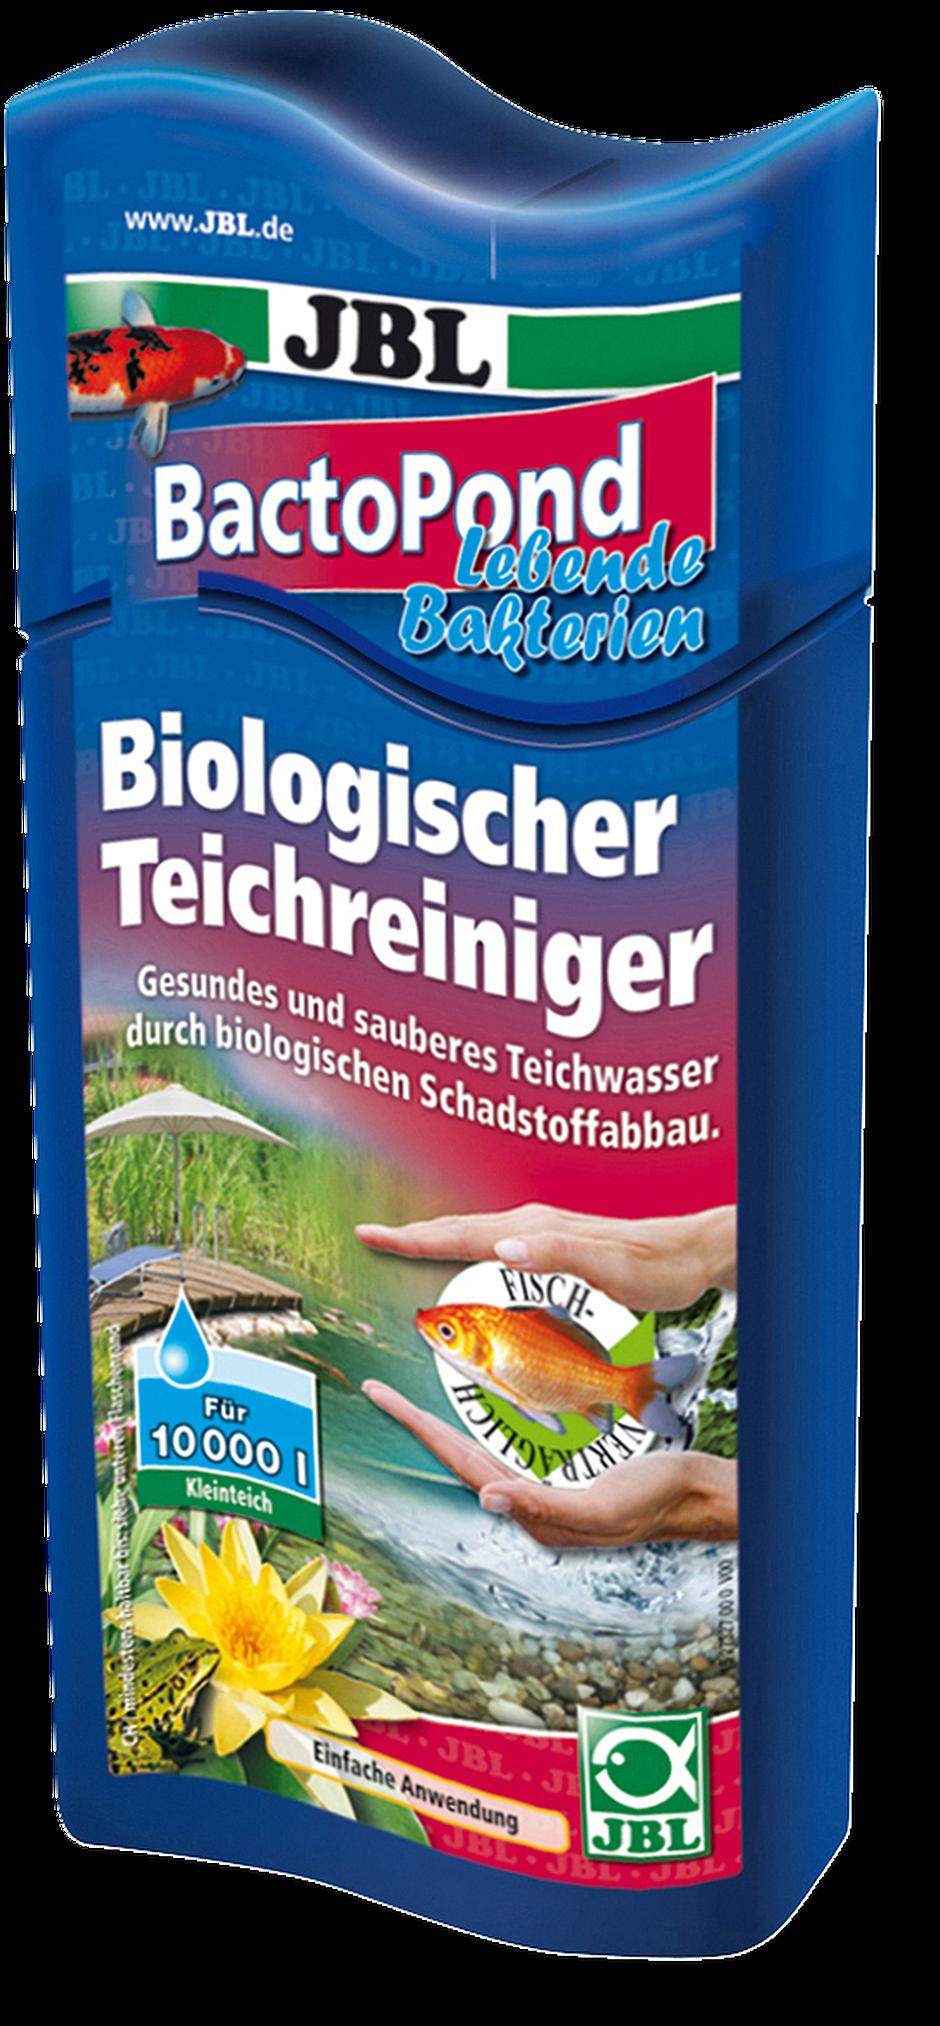 JBL BactoPond 250 ml